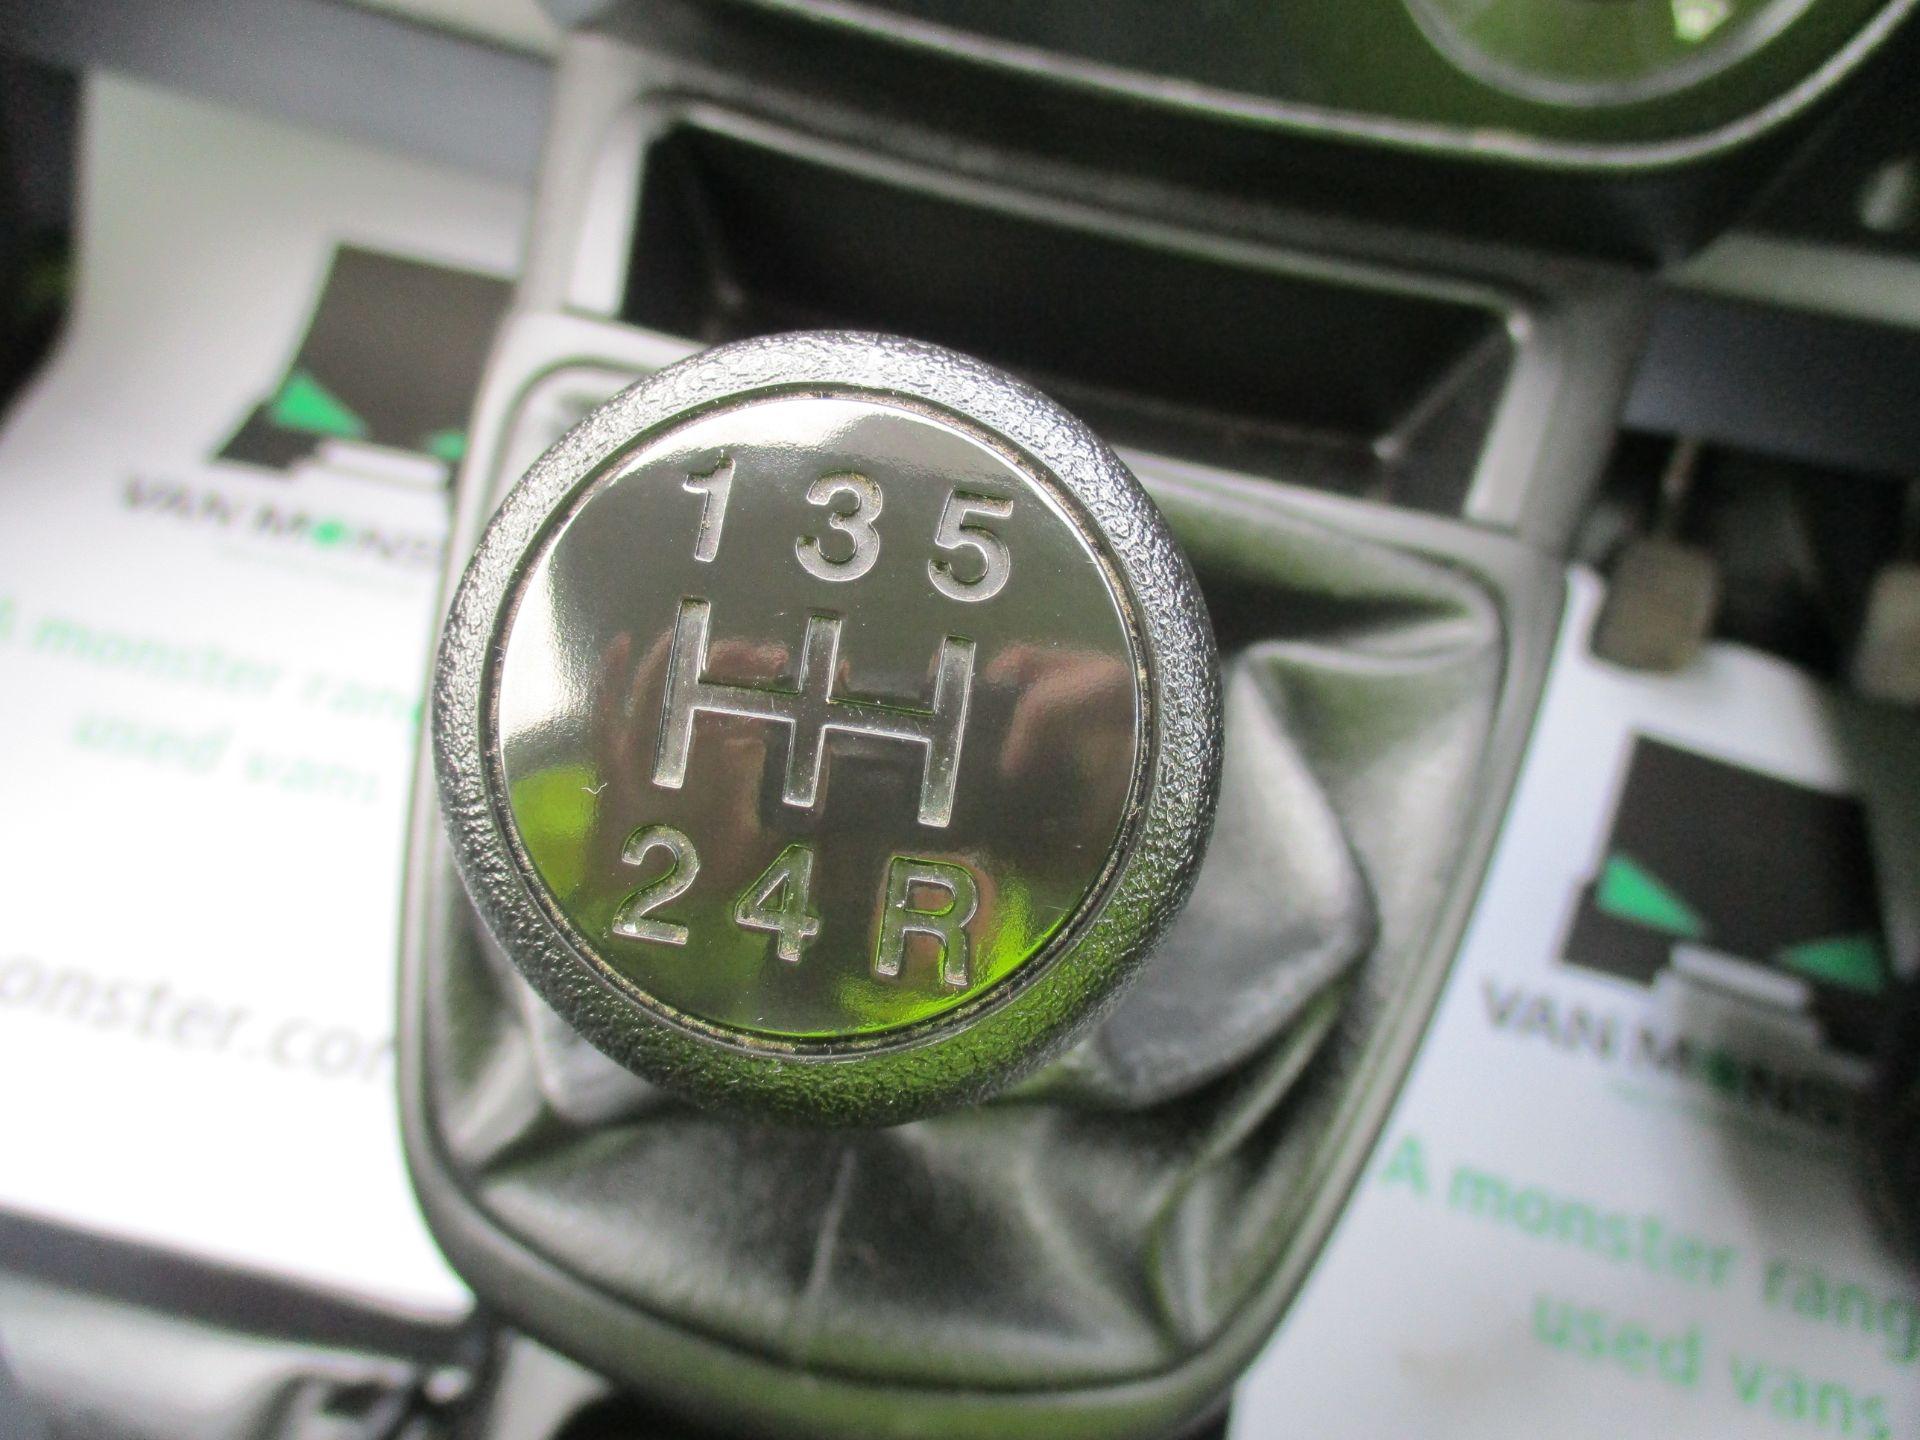 2015 Peugeot Bipper 1.3 HDI 75 S PLUS PACK EURO 5 (NV65FOD) Image 15